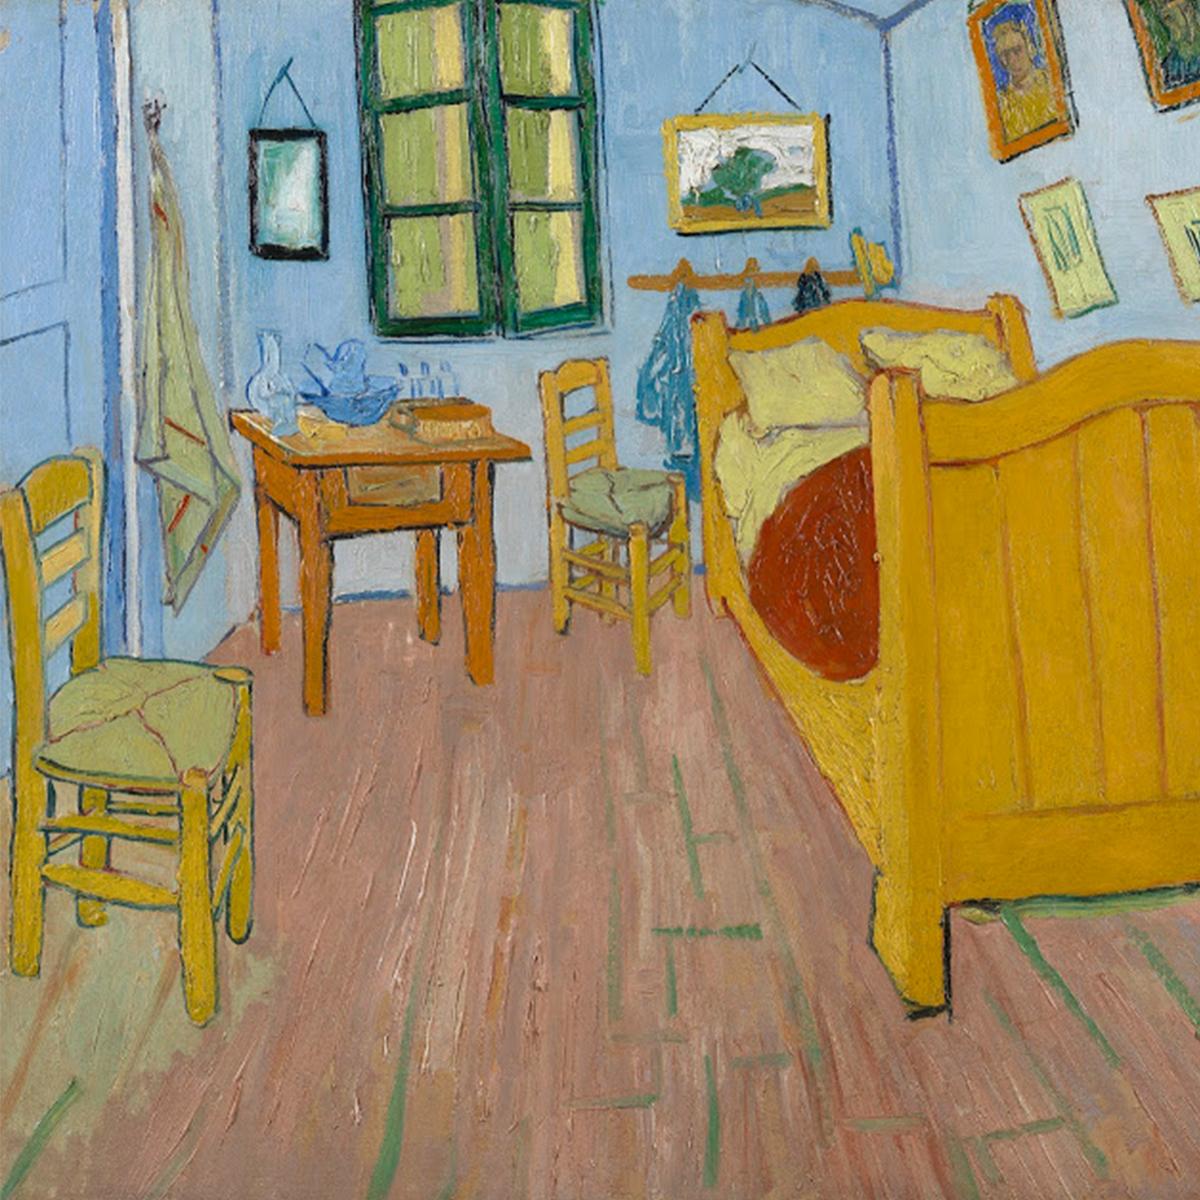 """The Bedroom"" Vincent Van Gogh, 1888 / Credits: Van Gogh Museum, Amsterdam"